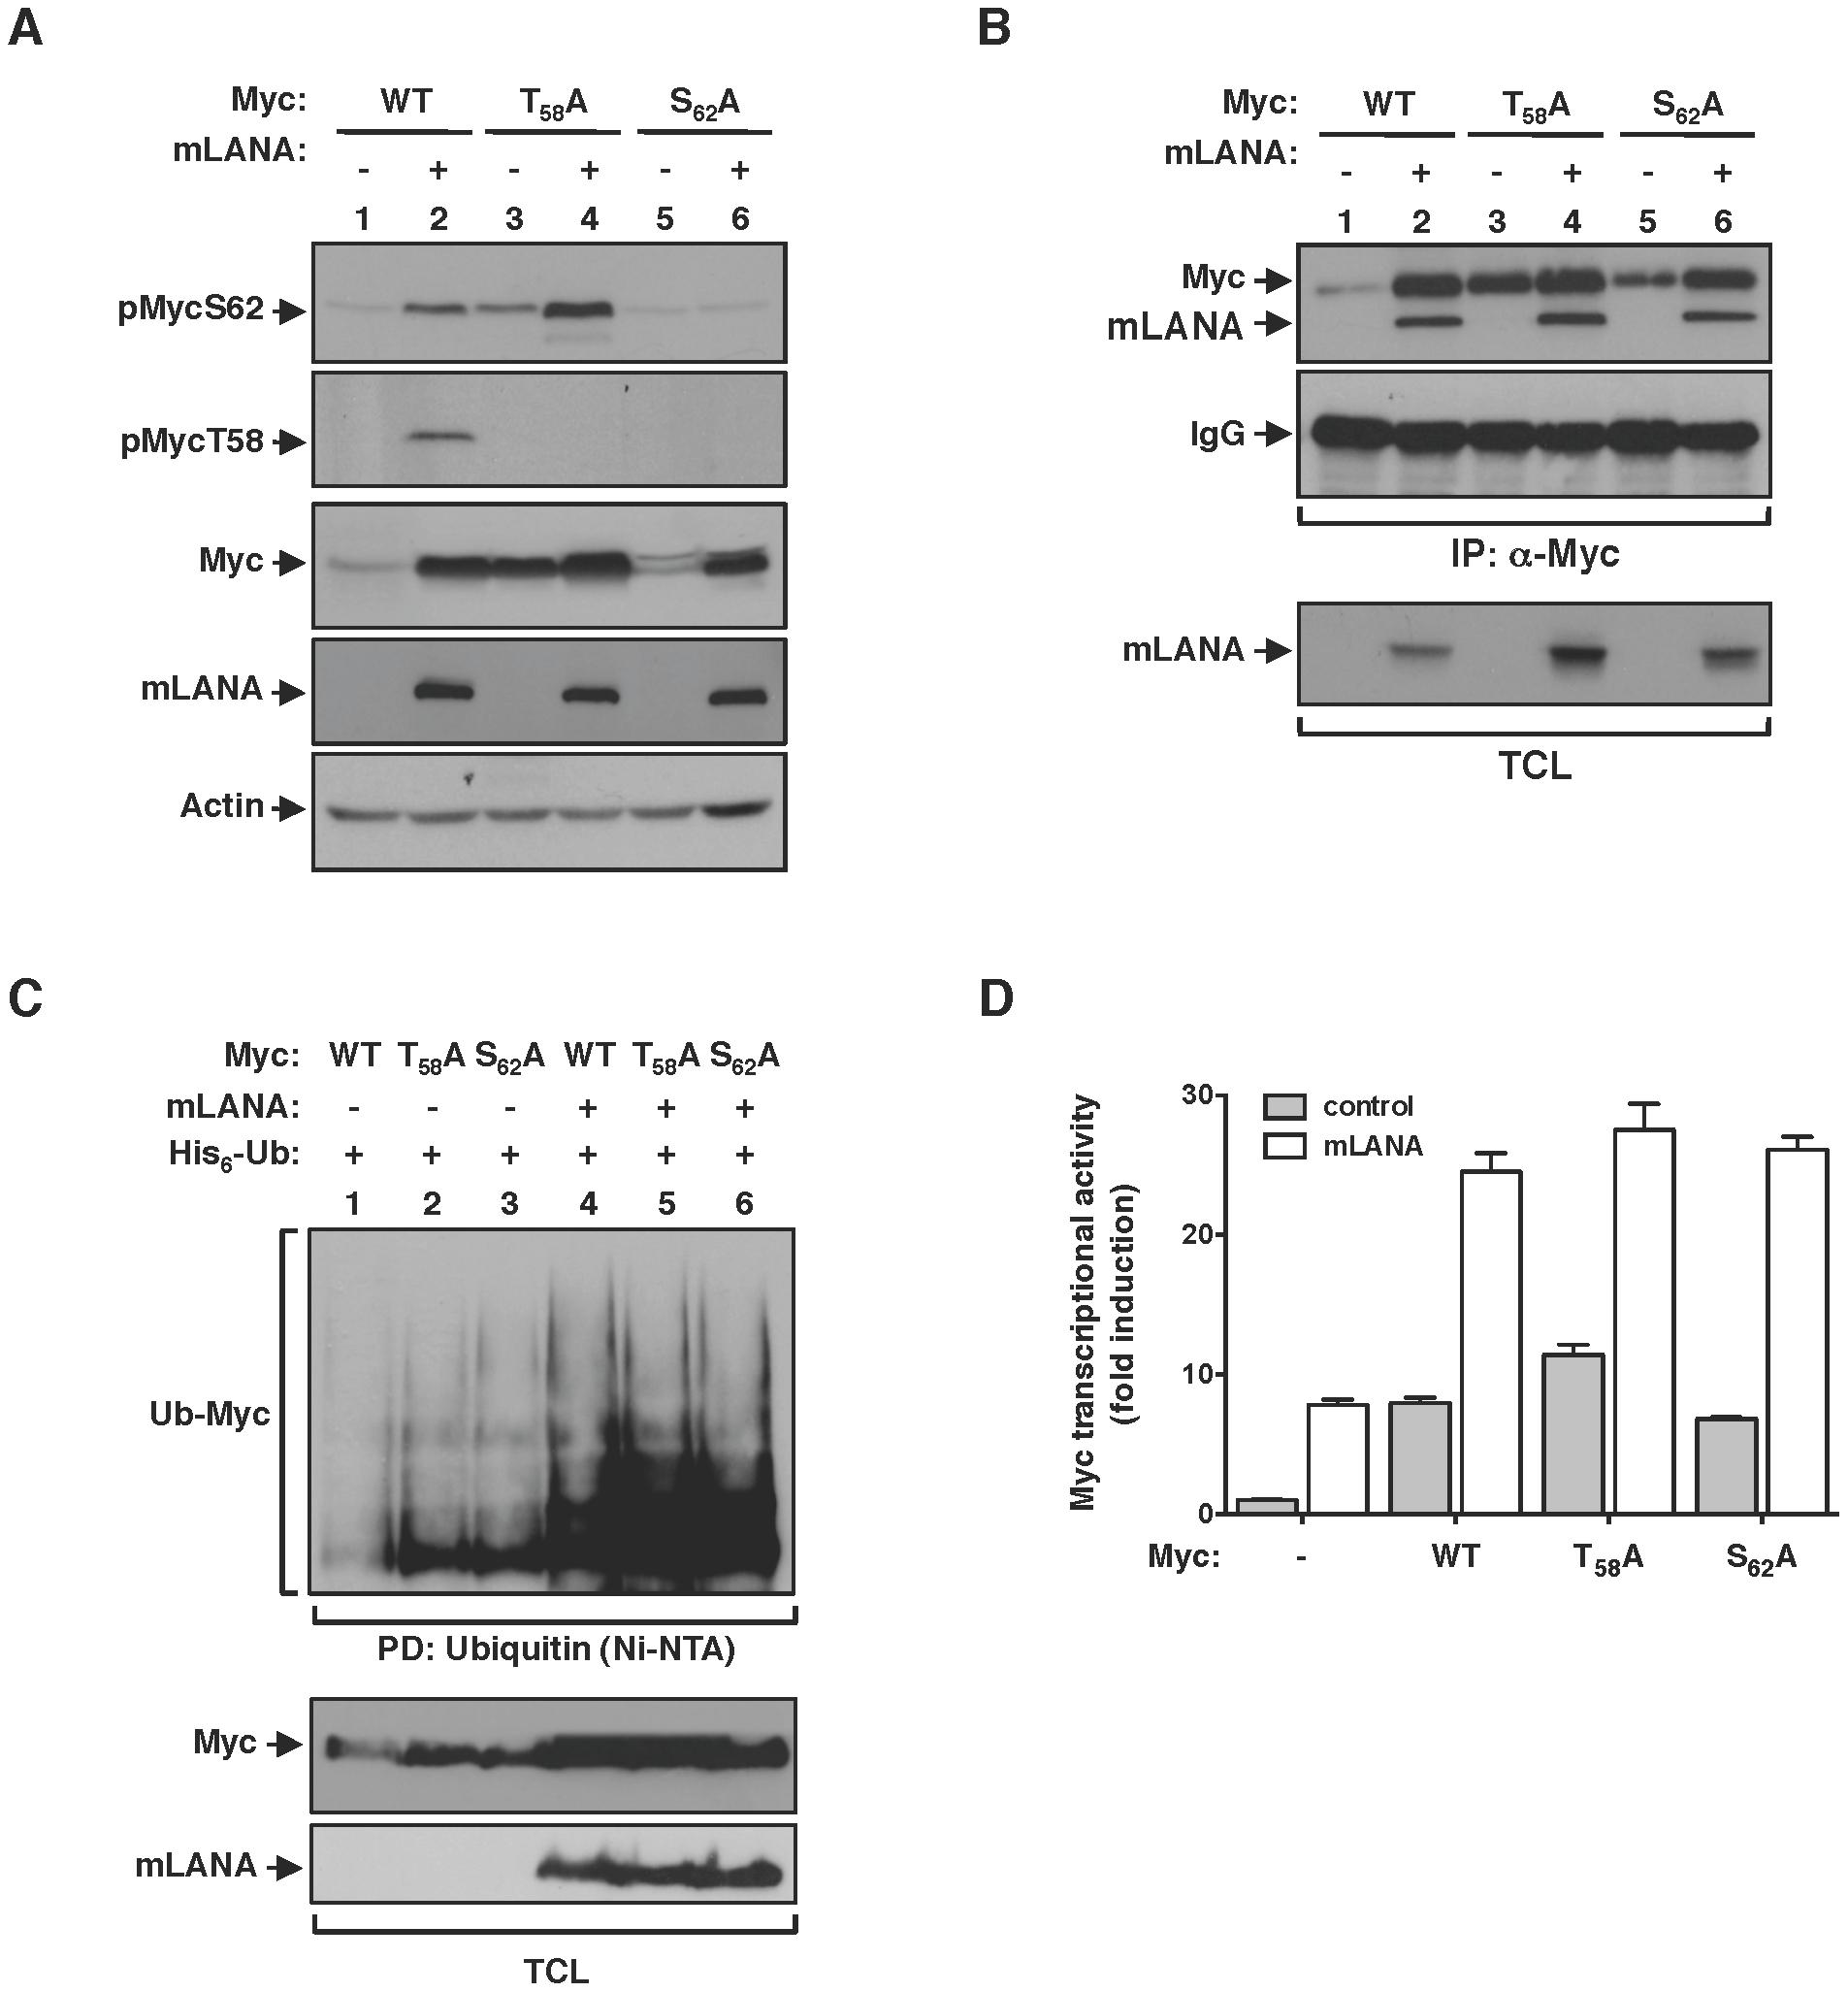 mLANA modulatory activity towards Myc is independent of Myc phosphorylation status.